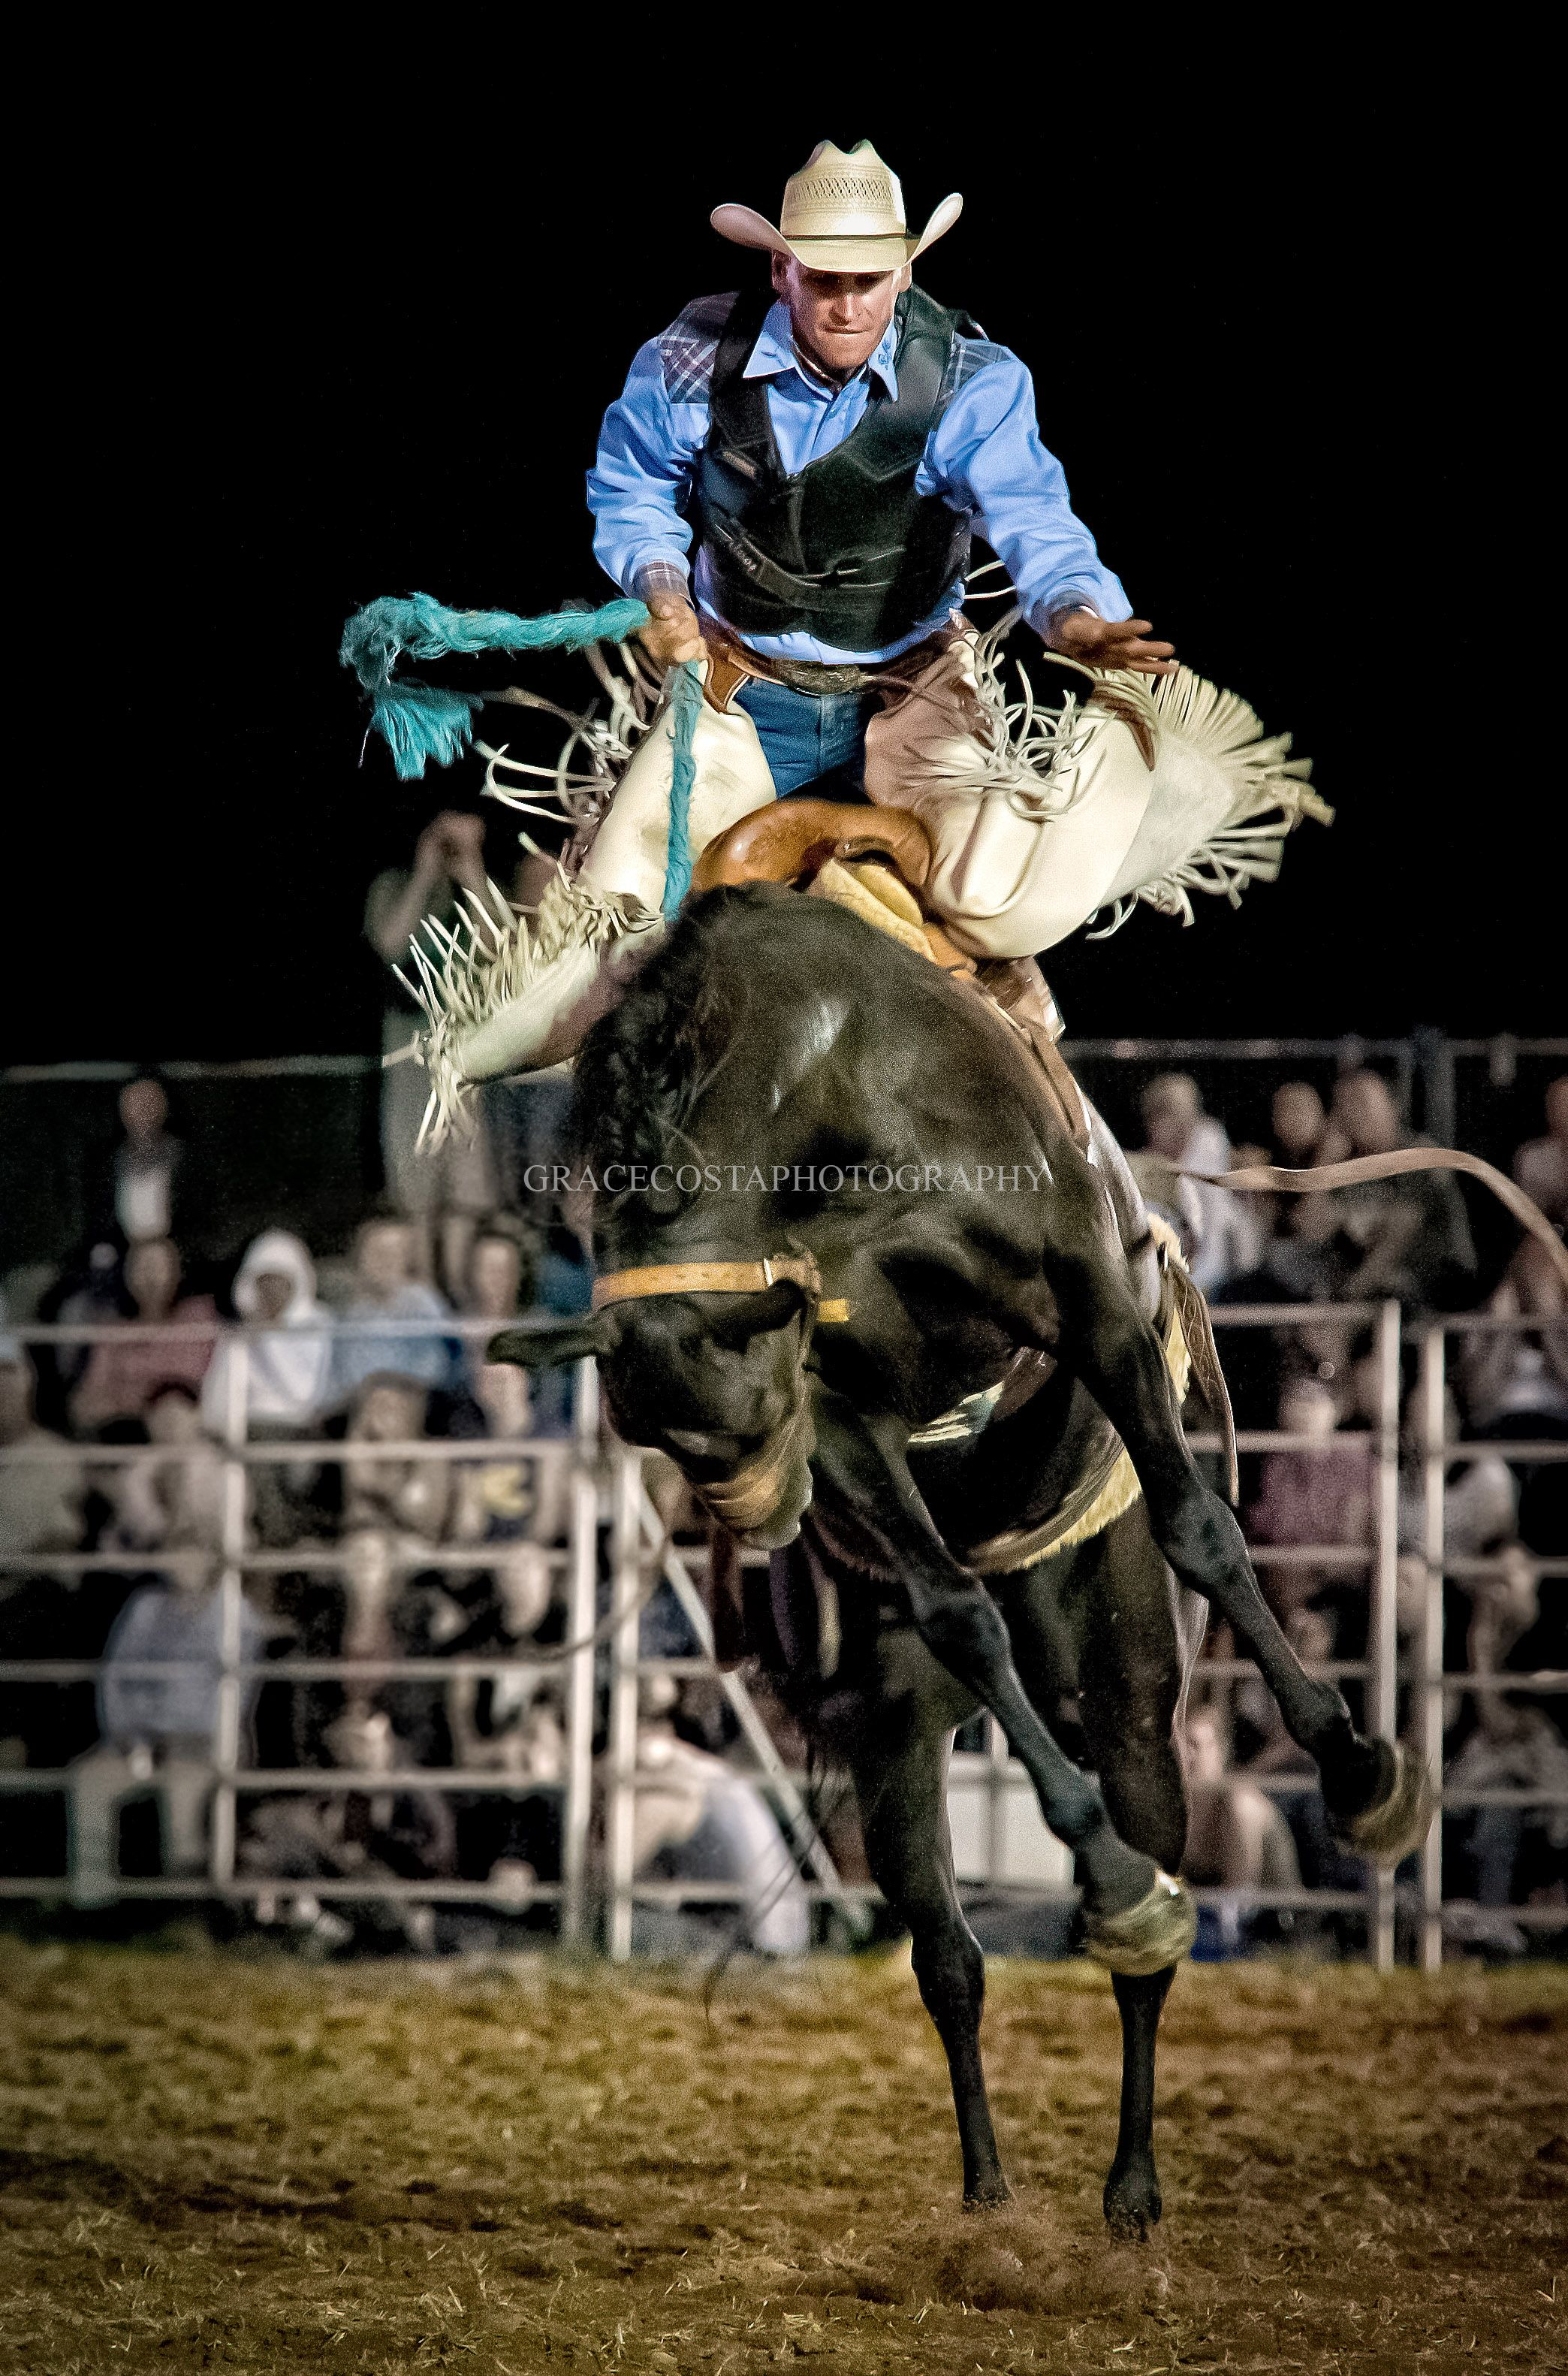 gay pro rodeo cowboys